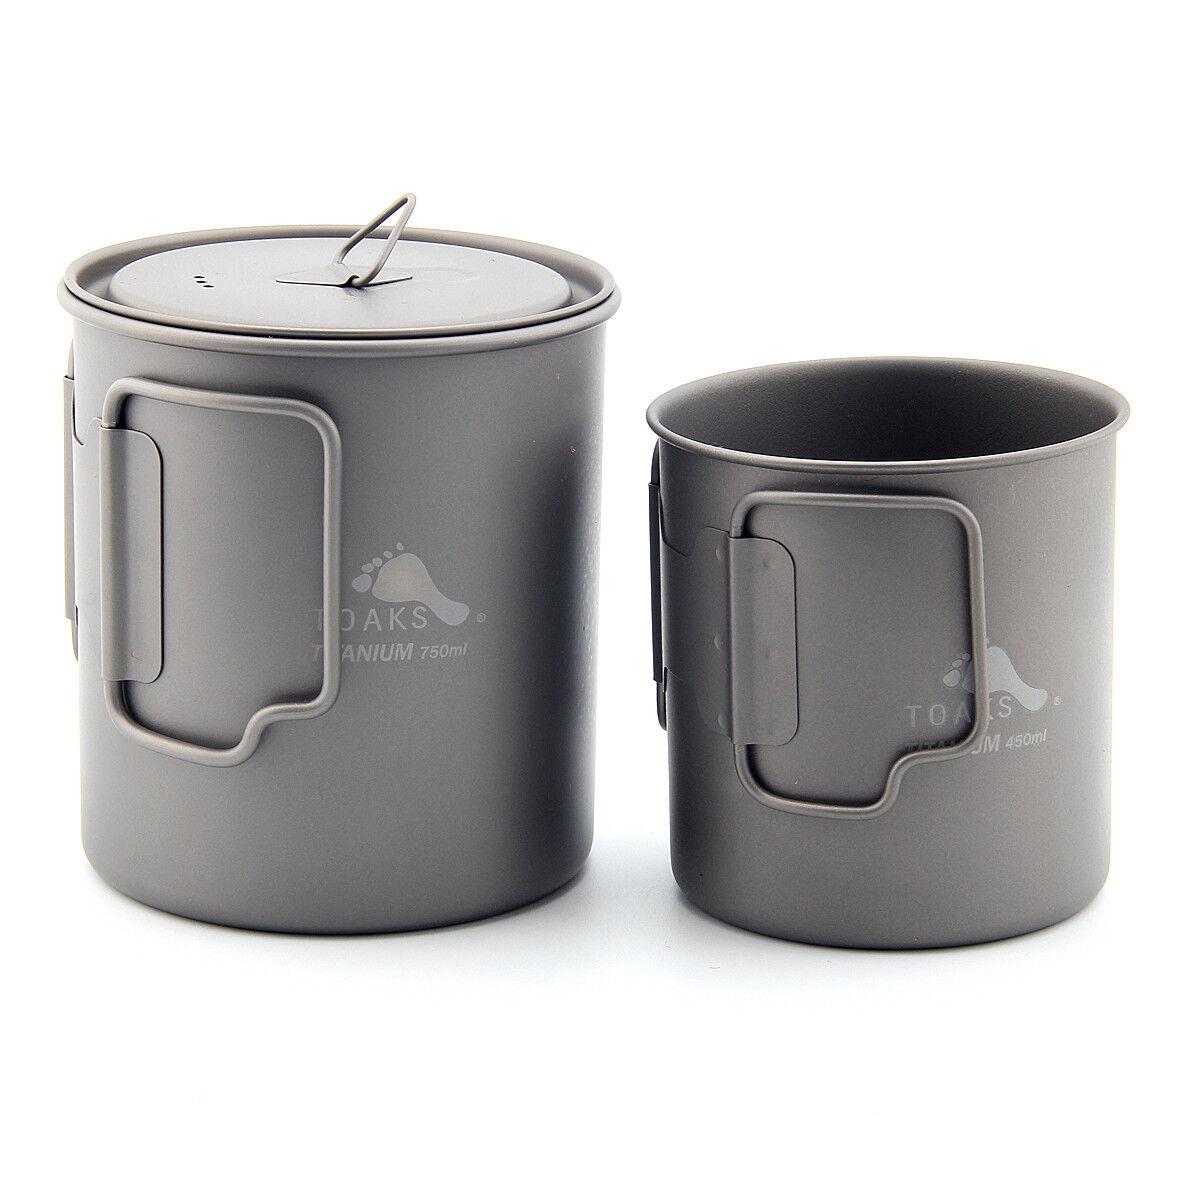 Toaks utensilios de cocina de titanio Camping